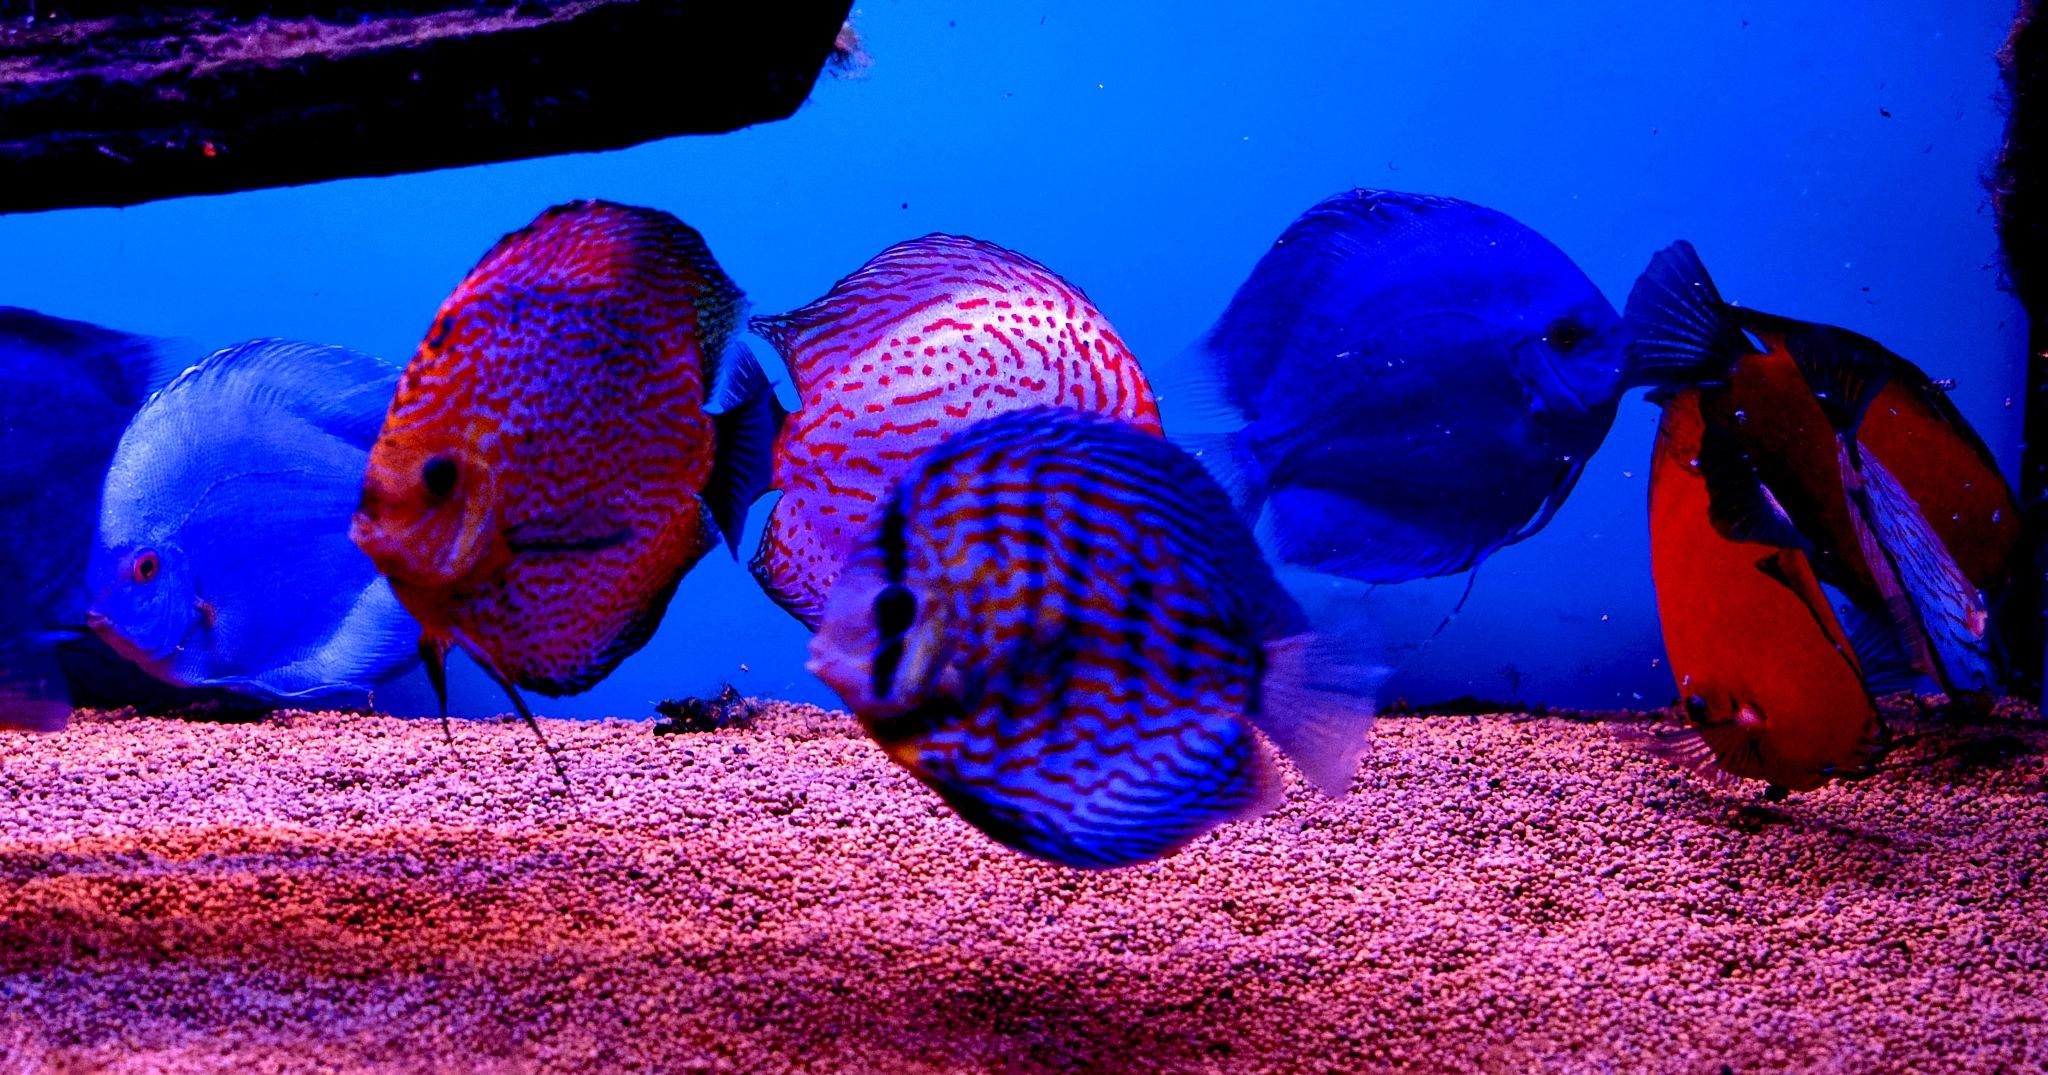 Aquarium 23  by Florian B